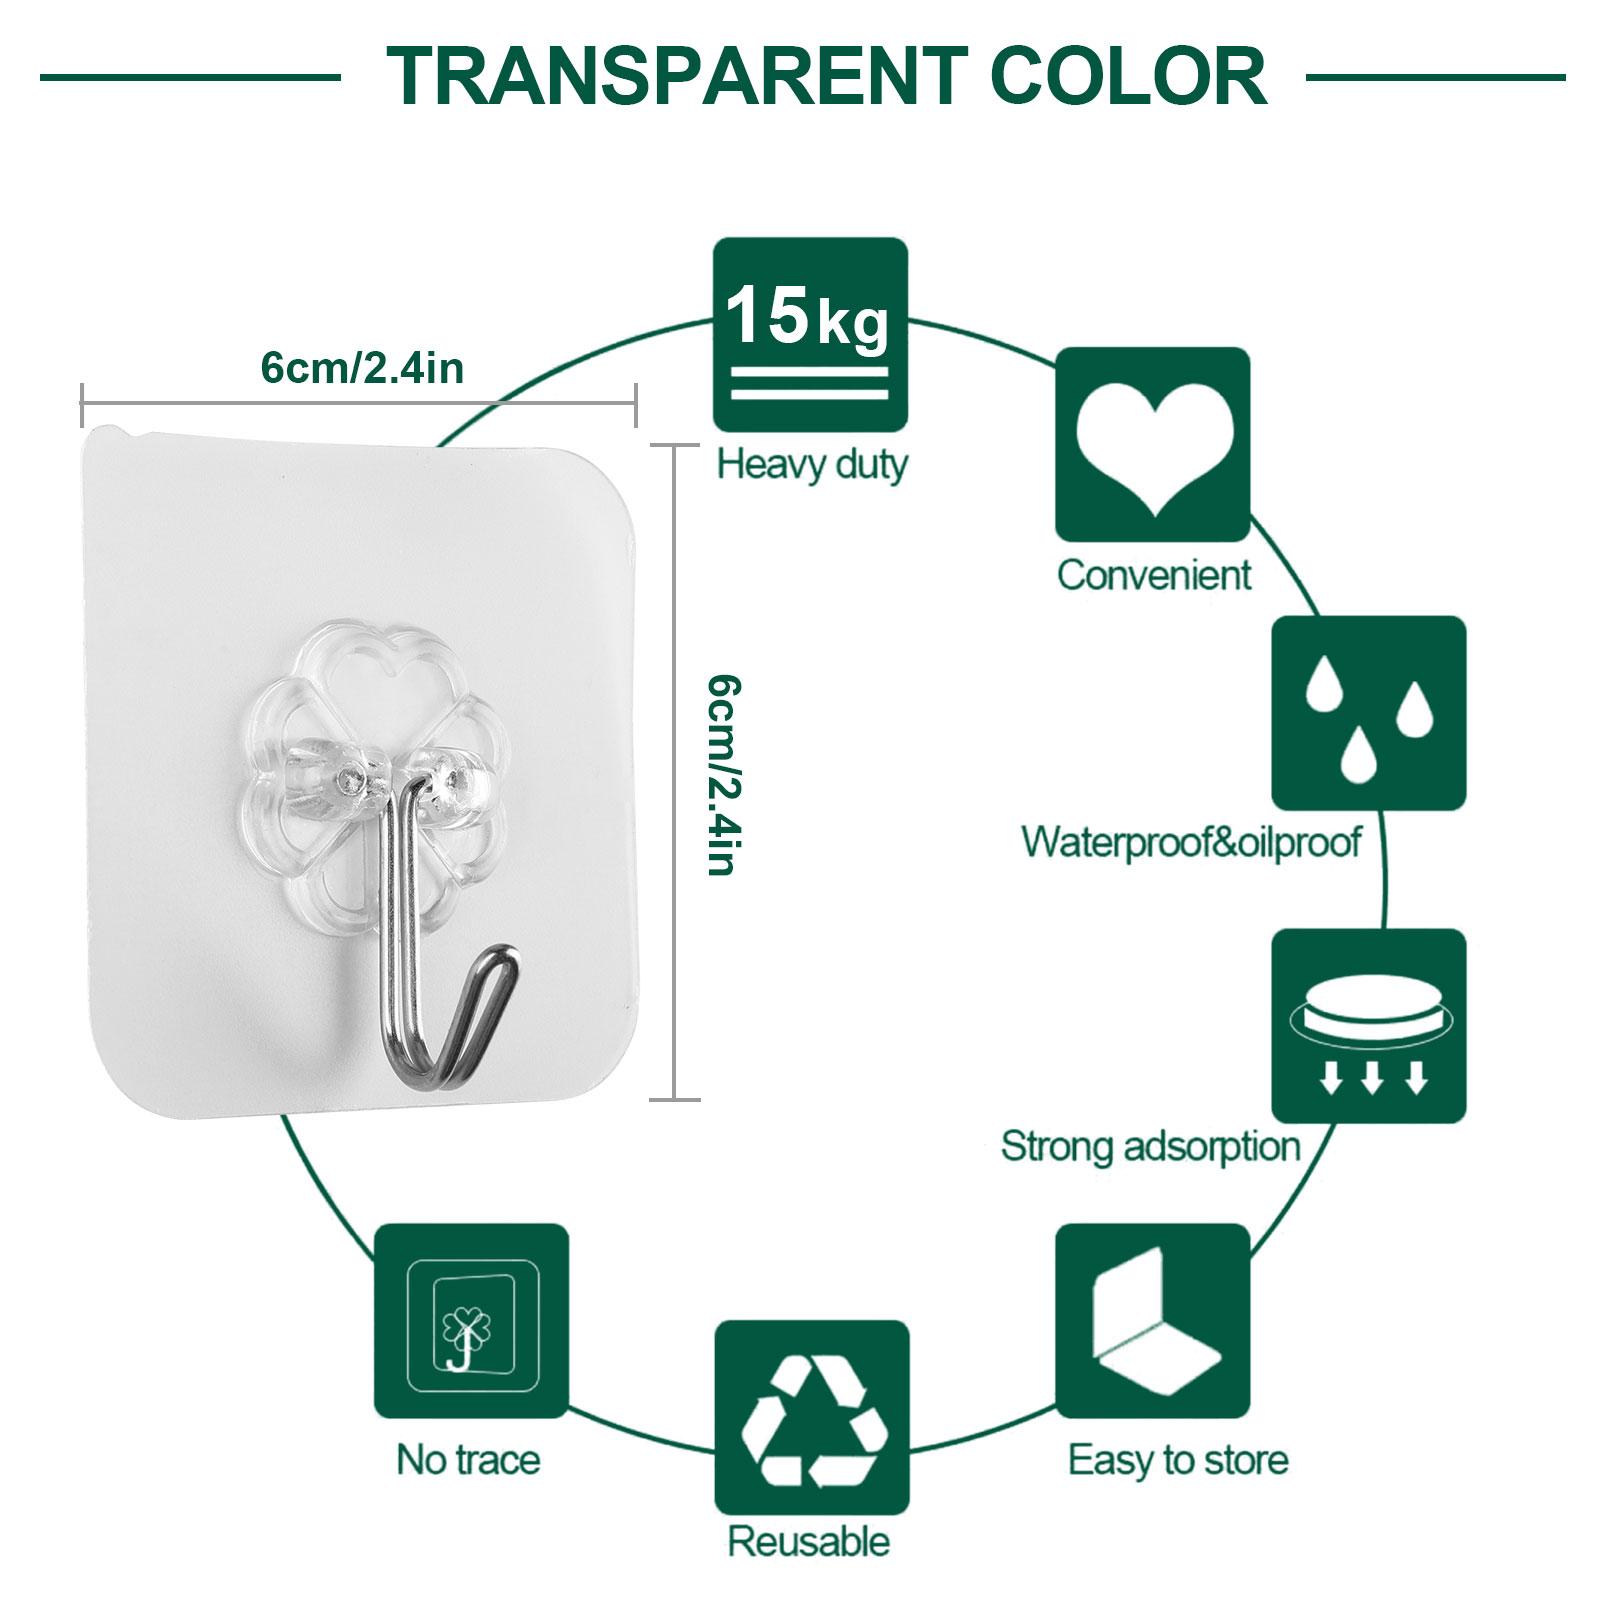 20-40x-Adhesive-Sticky-Hooks-Heavy-Duty-Wall-Seamless-Hooks-Hangers-Transparent thumbnail 3